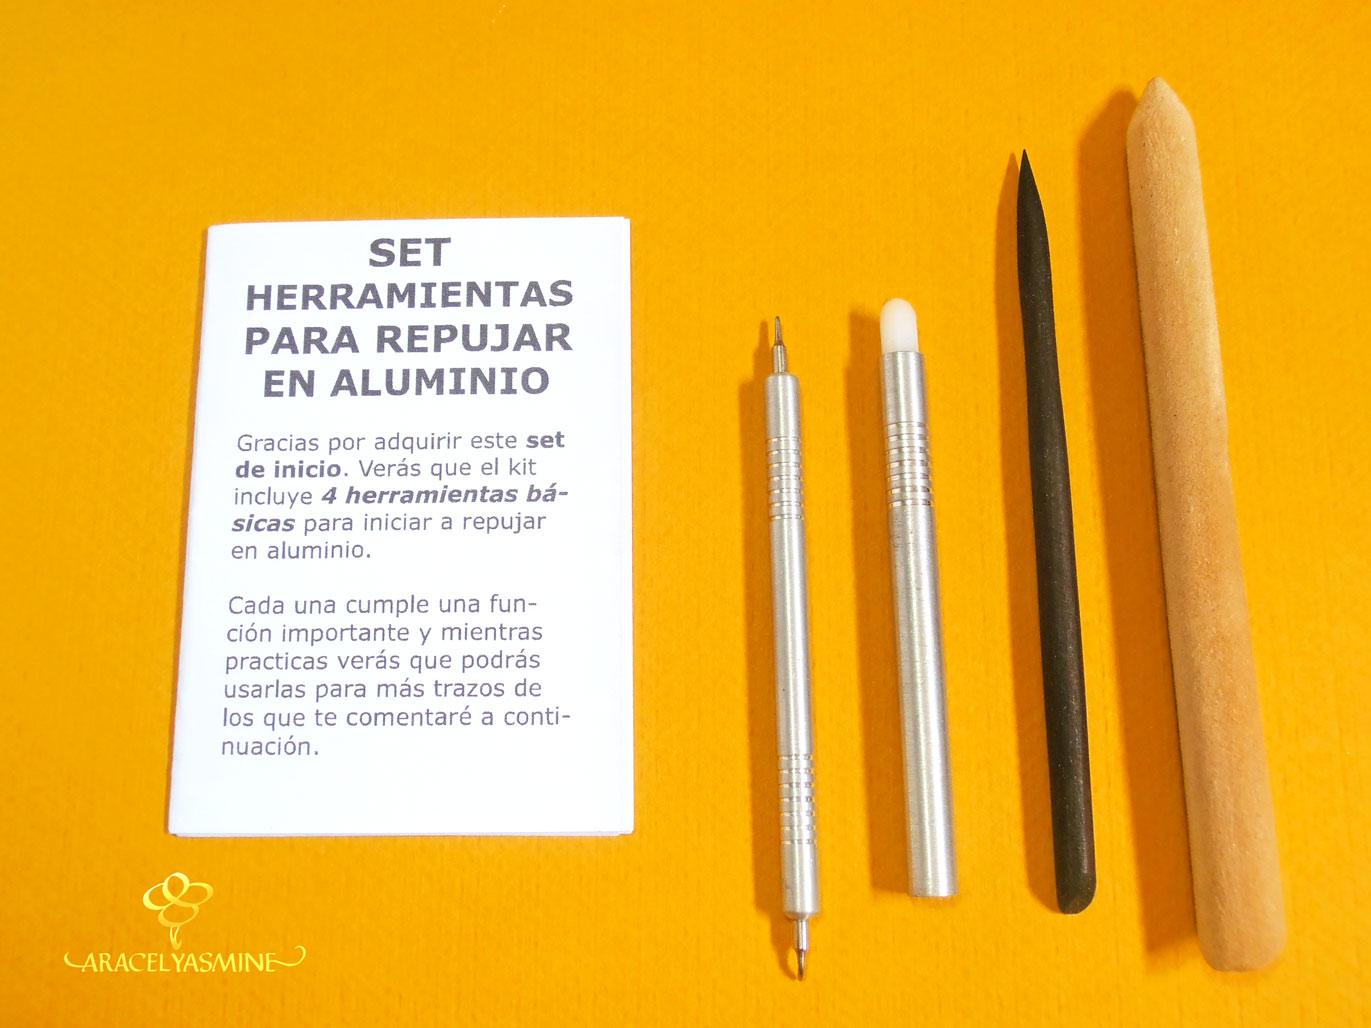 kit set herramientas para repujar en aluminio basico